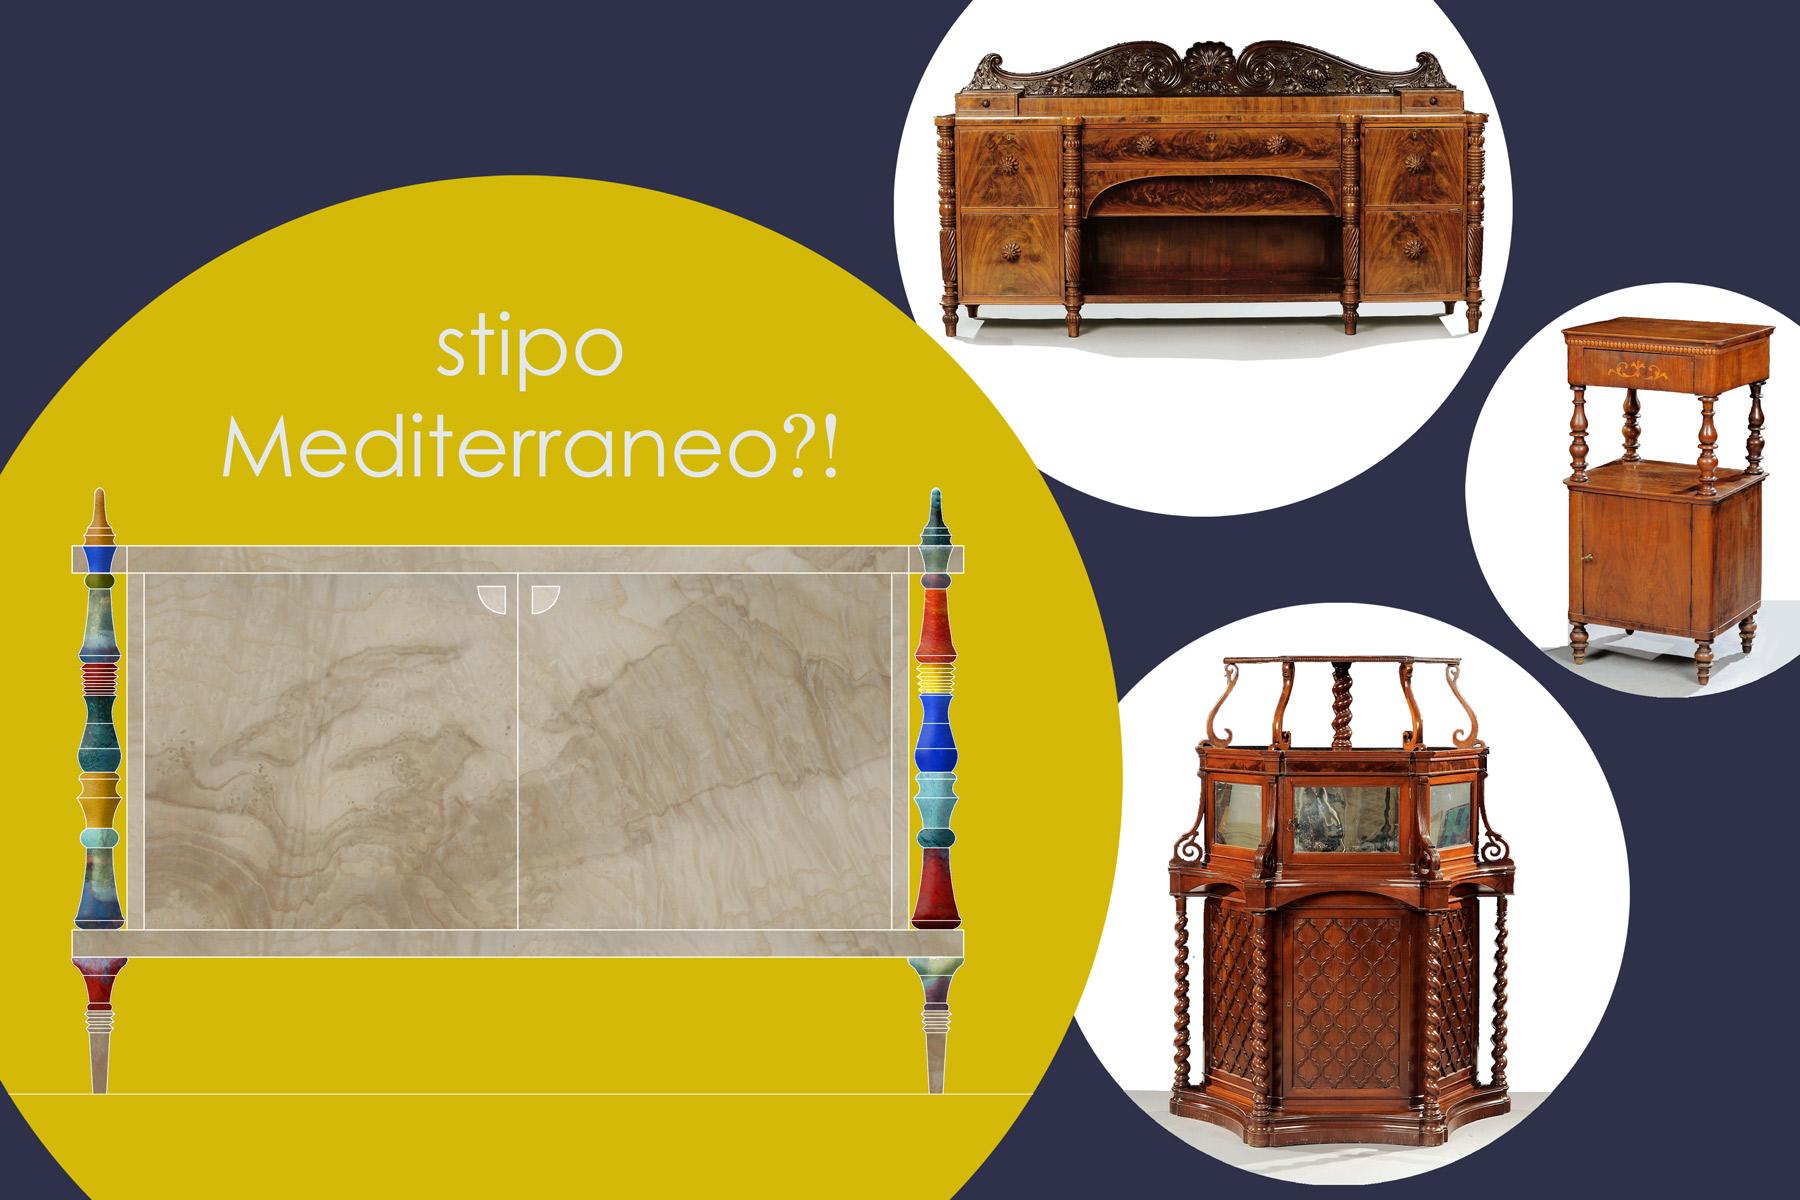 2_stipo-Mediterraneo